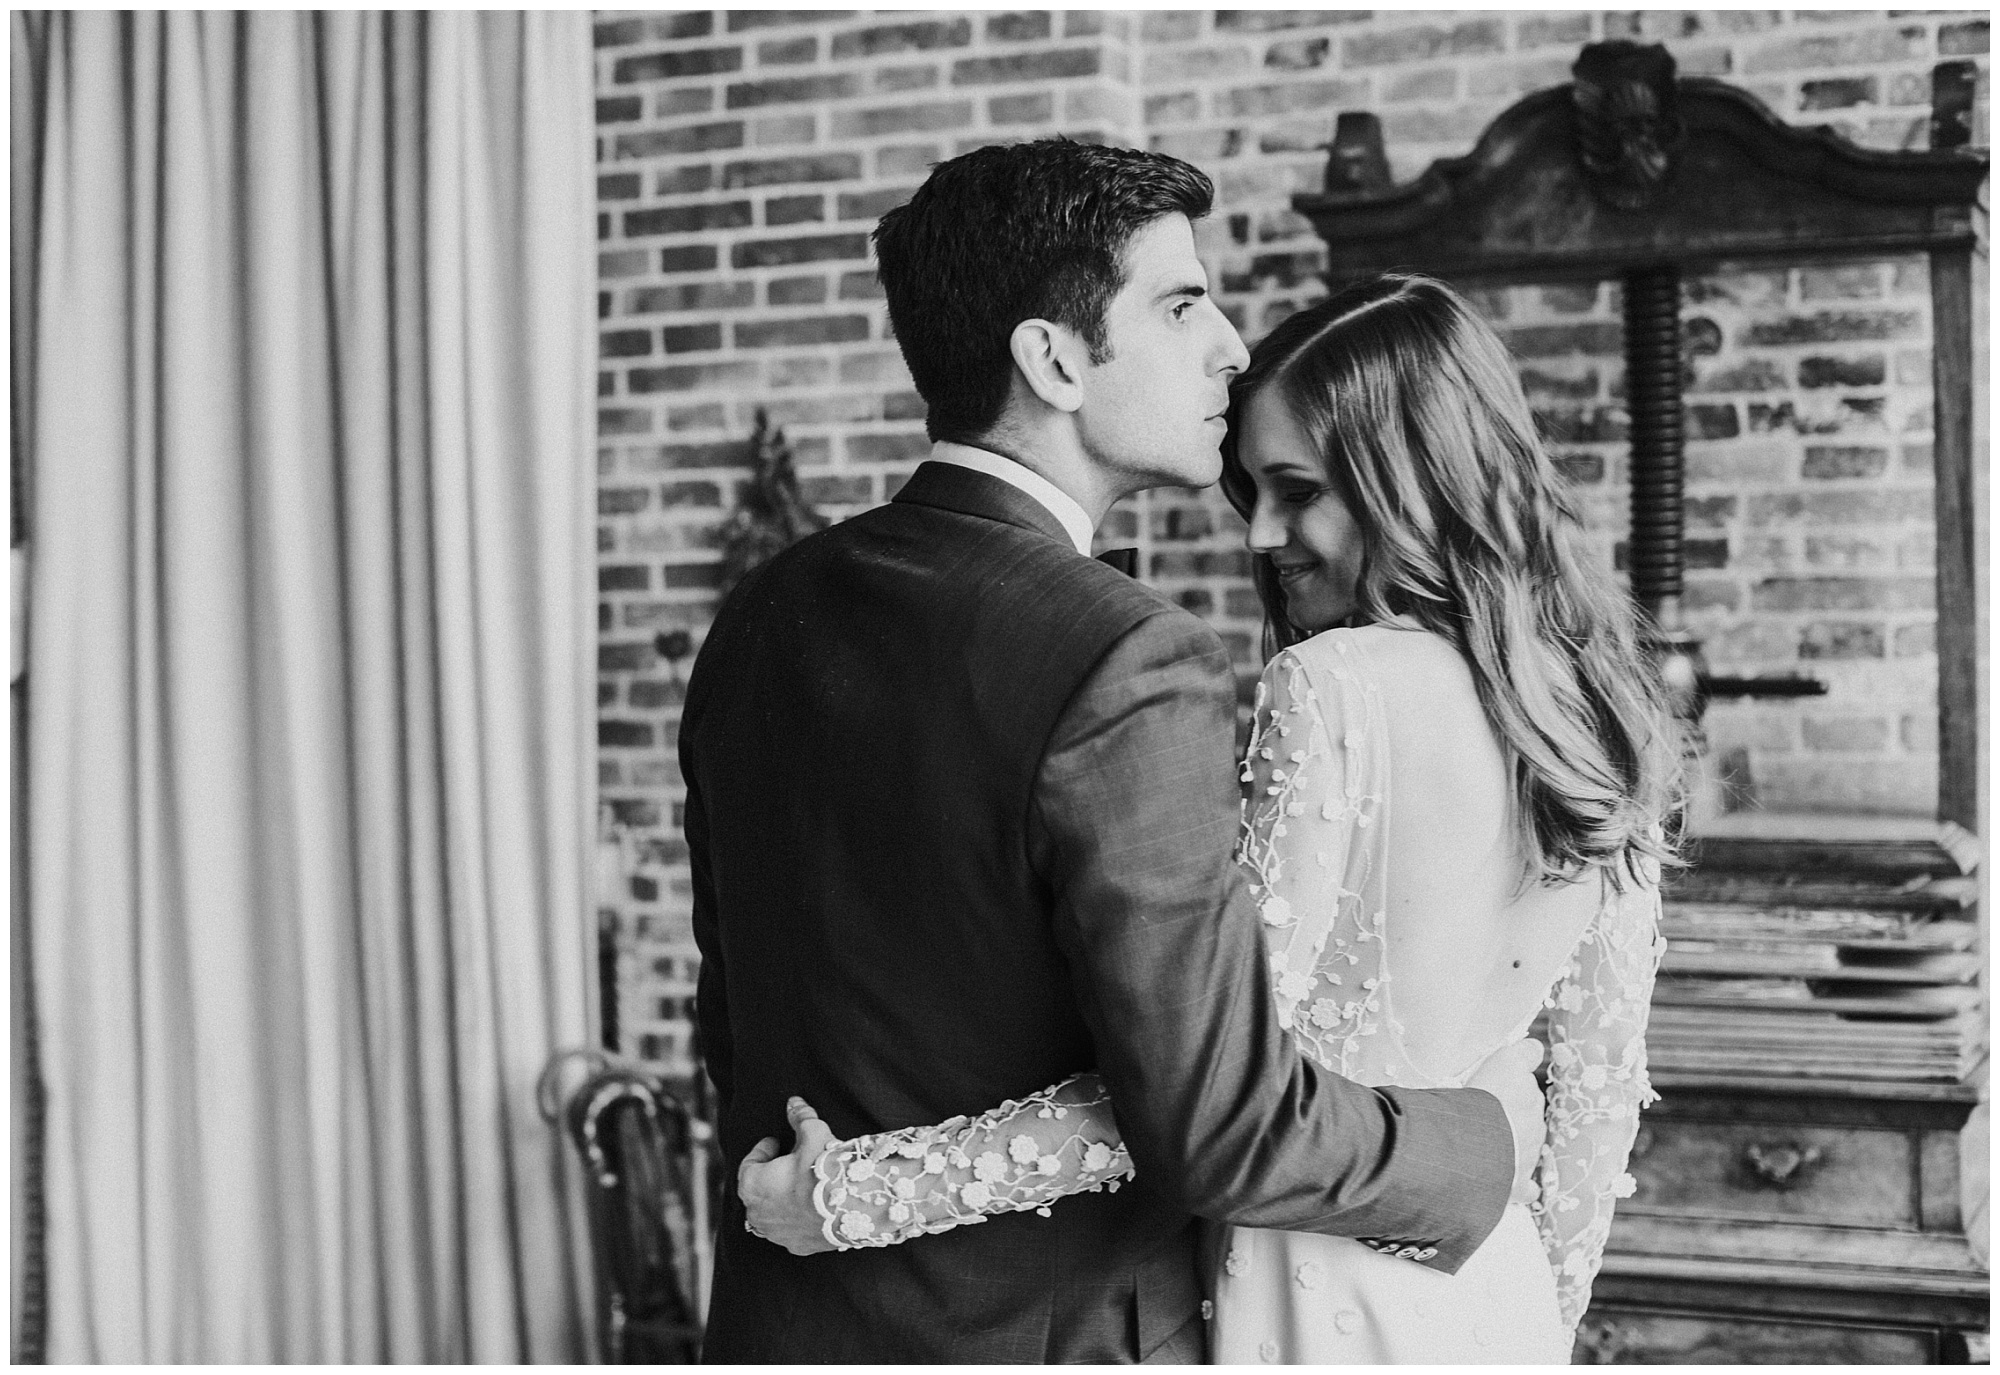 Kateryna-photos-photographer-rouen-domaine-des-evis-mariage-normandie-photos-de-couple